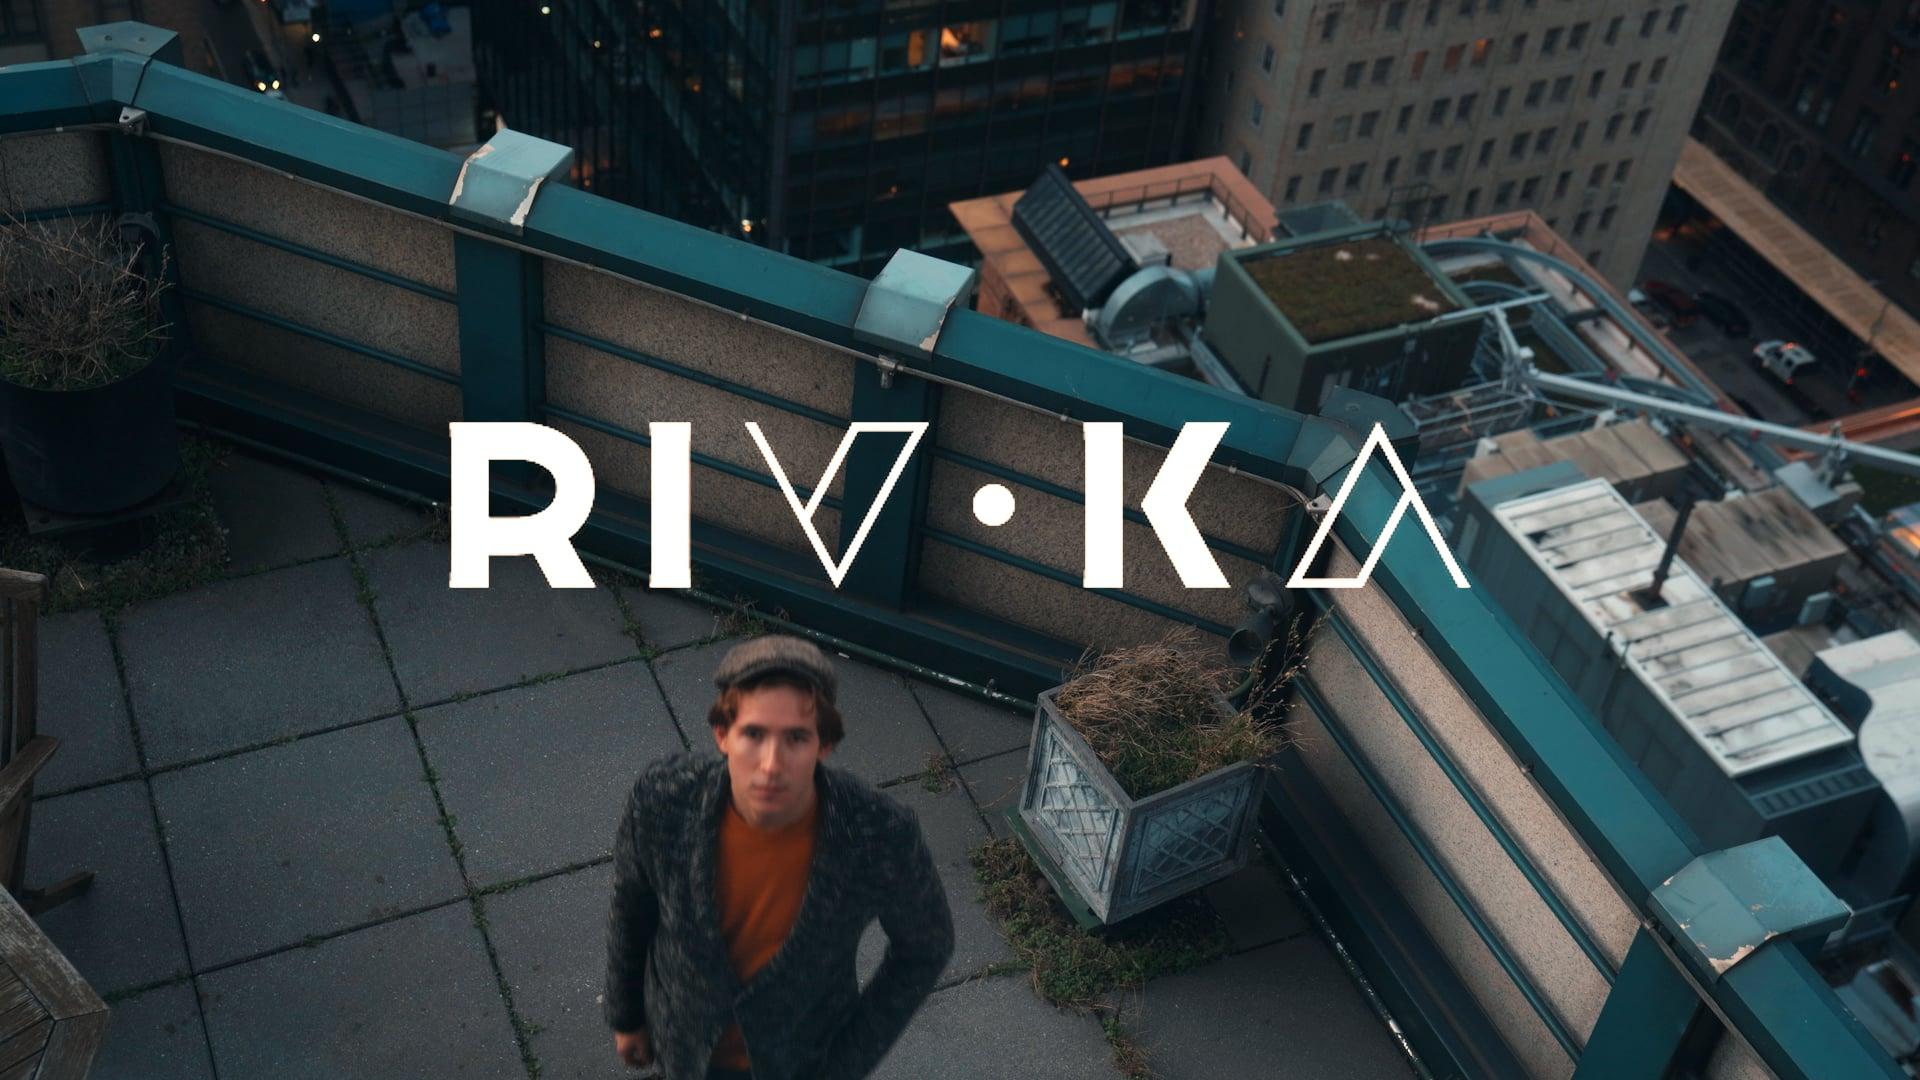 RIVKA Shoes Commercial - Part VIII